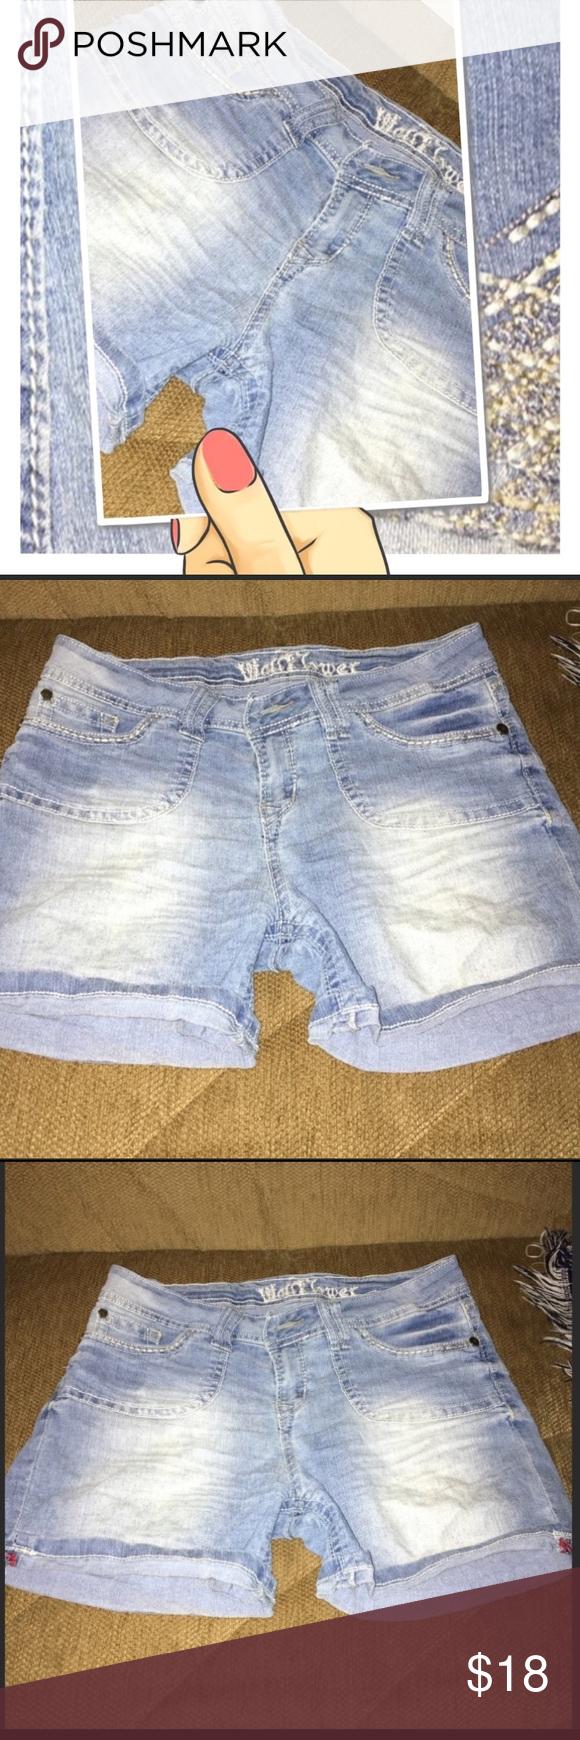 for wallflower jean shorts soft jeans jr size light blue denim see measurements chart also in my posh picks rh pinterest